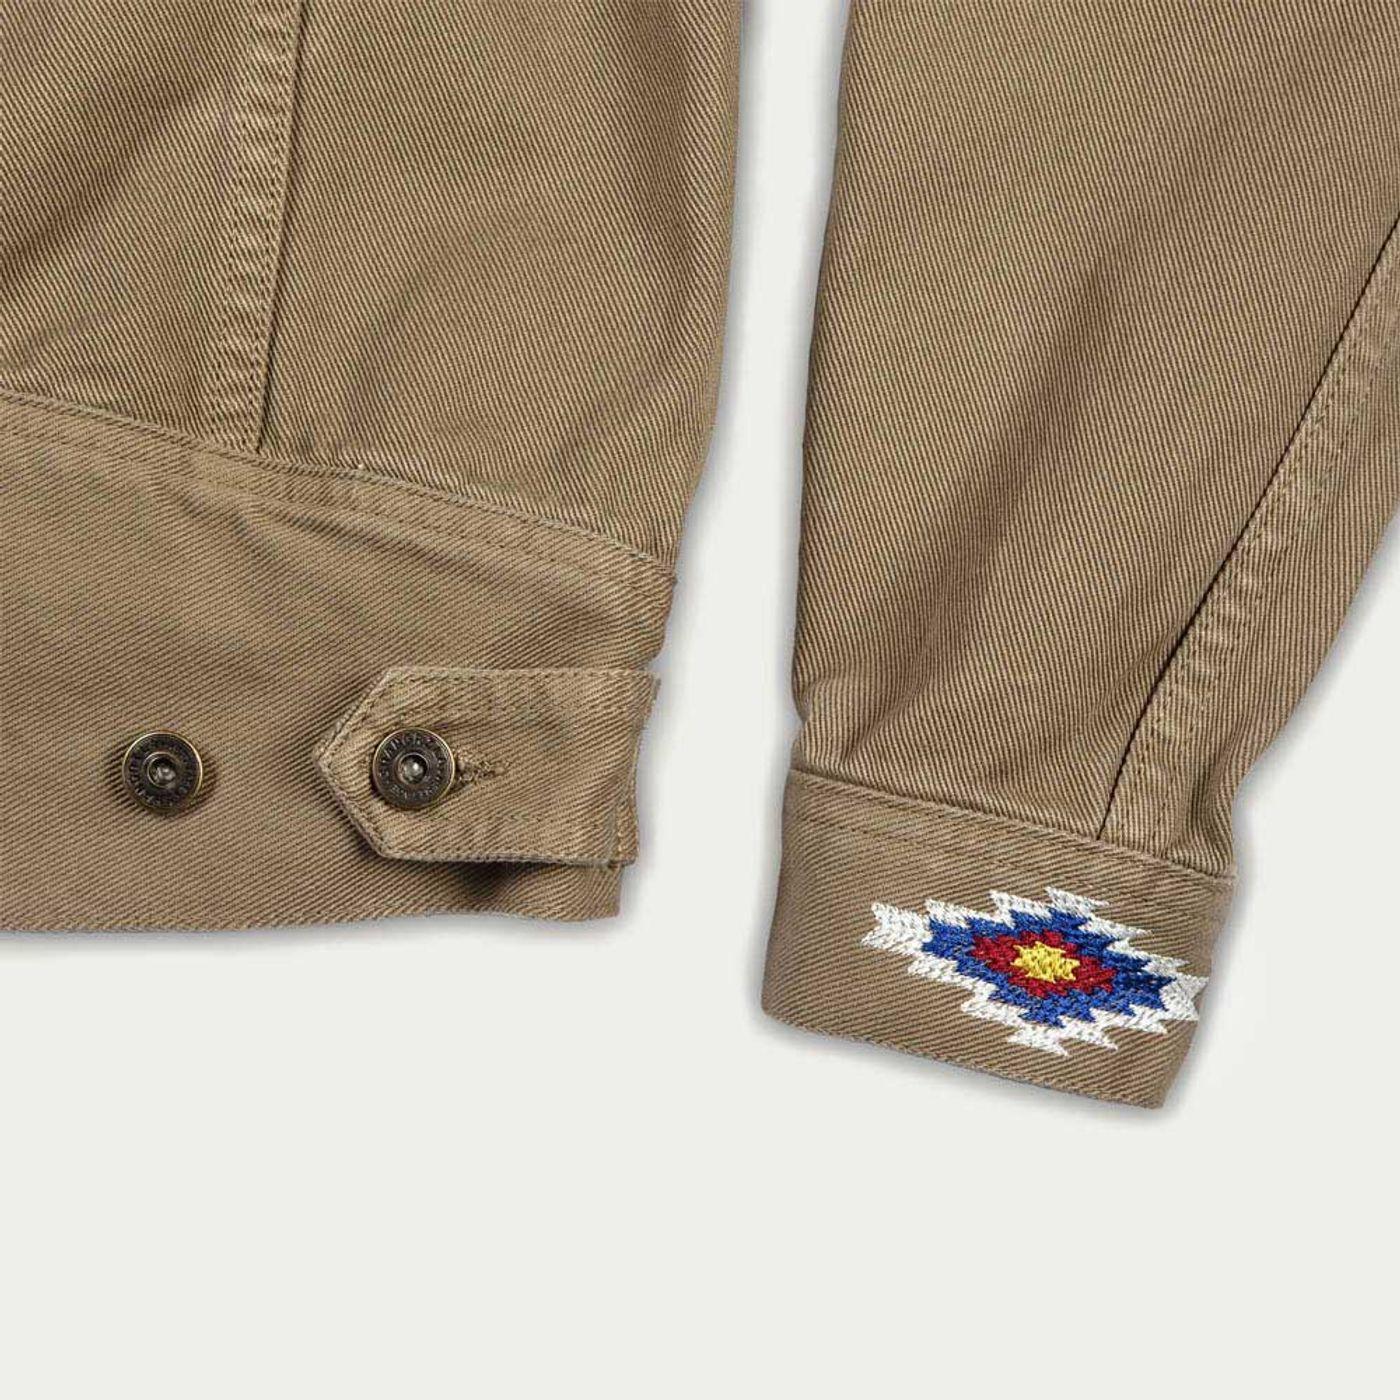 Army Canvas Single Rider Jacket Sparviero Navajo Limite Edition  | Bombinate